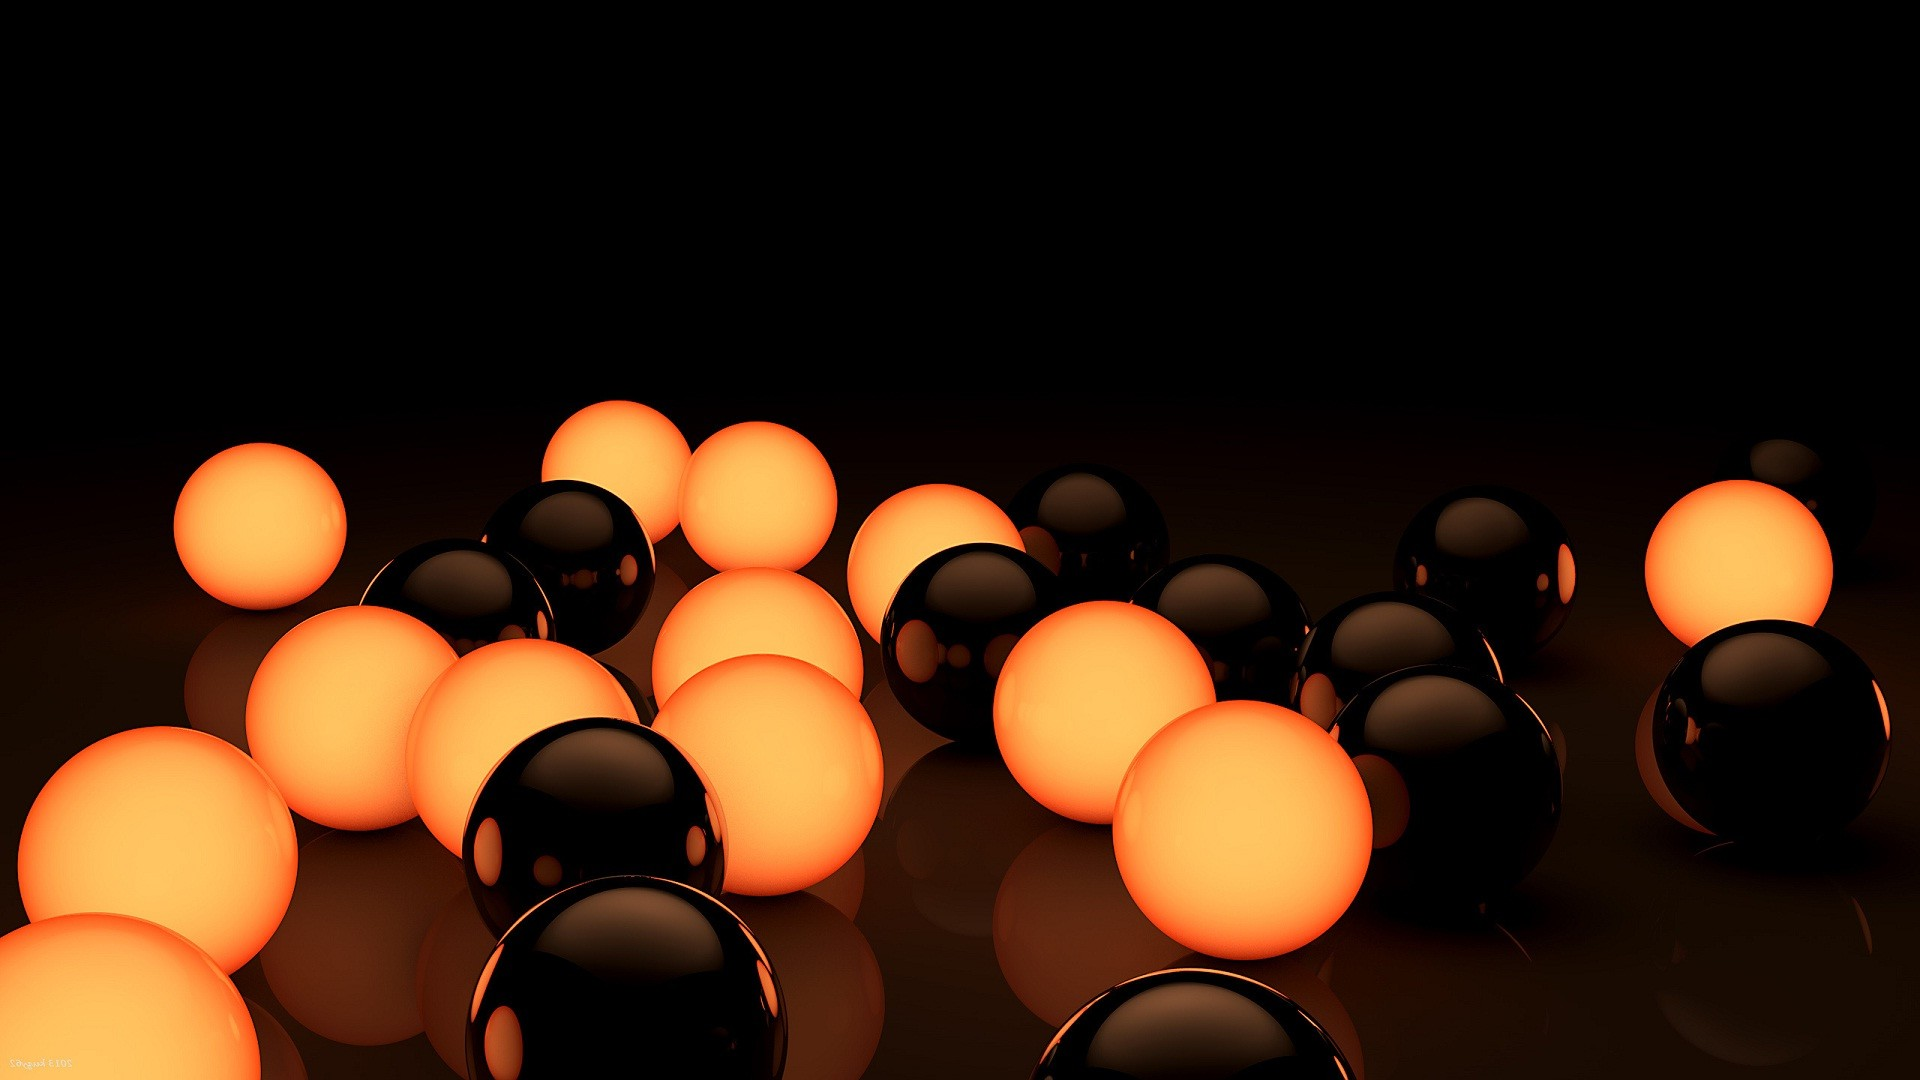 Res: 1920x1080, Black orange 3D globe amazing